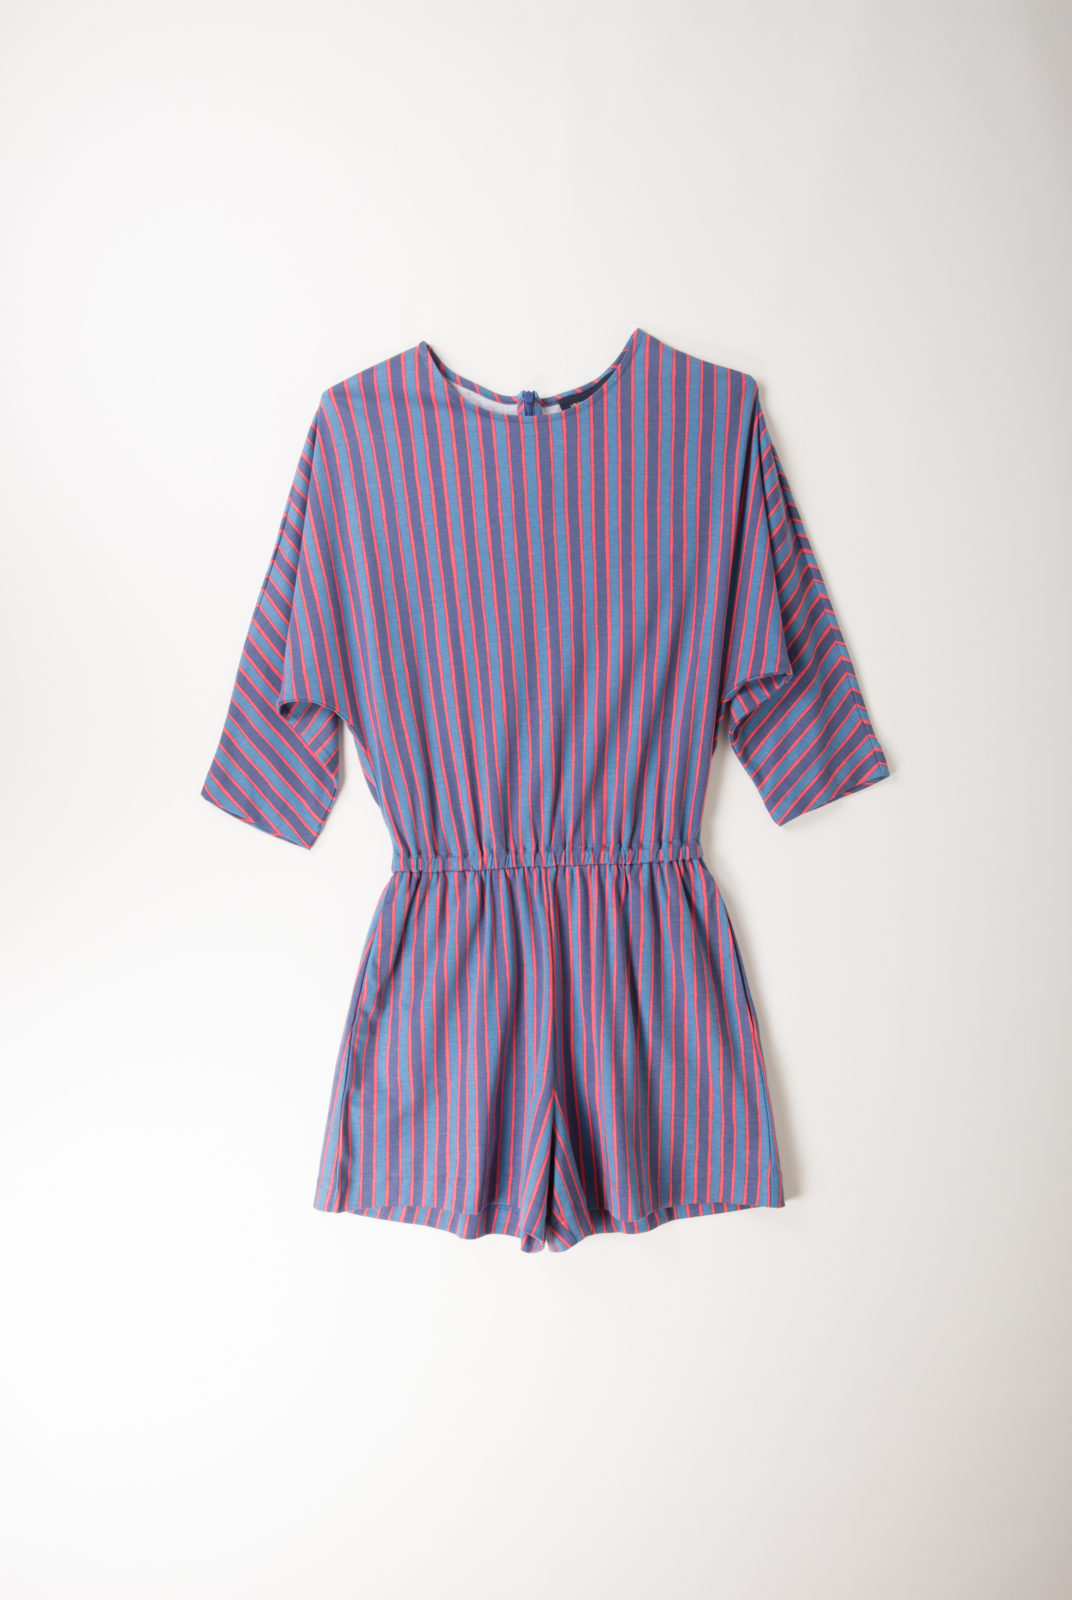 combishort, bleu foncé, jersey de coton, motif rayé, décontractée, féminine, vanessa seward